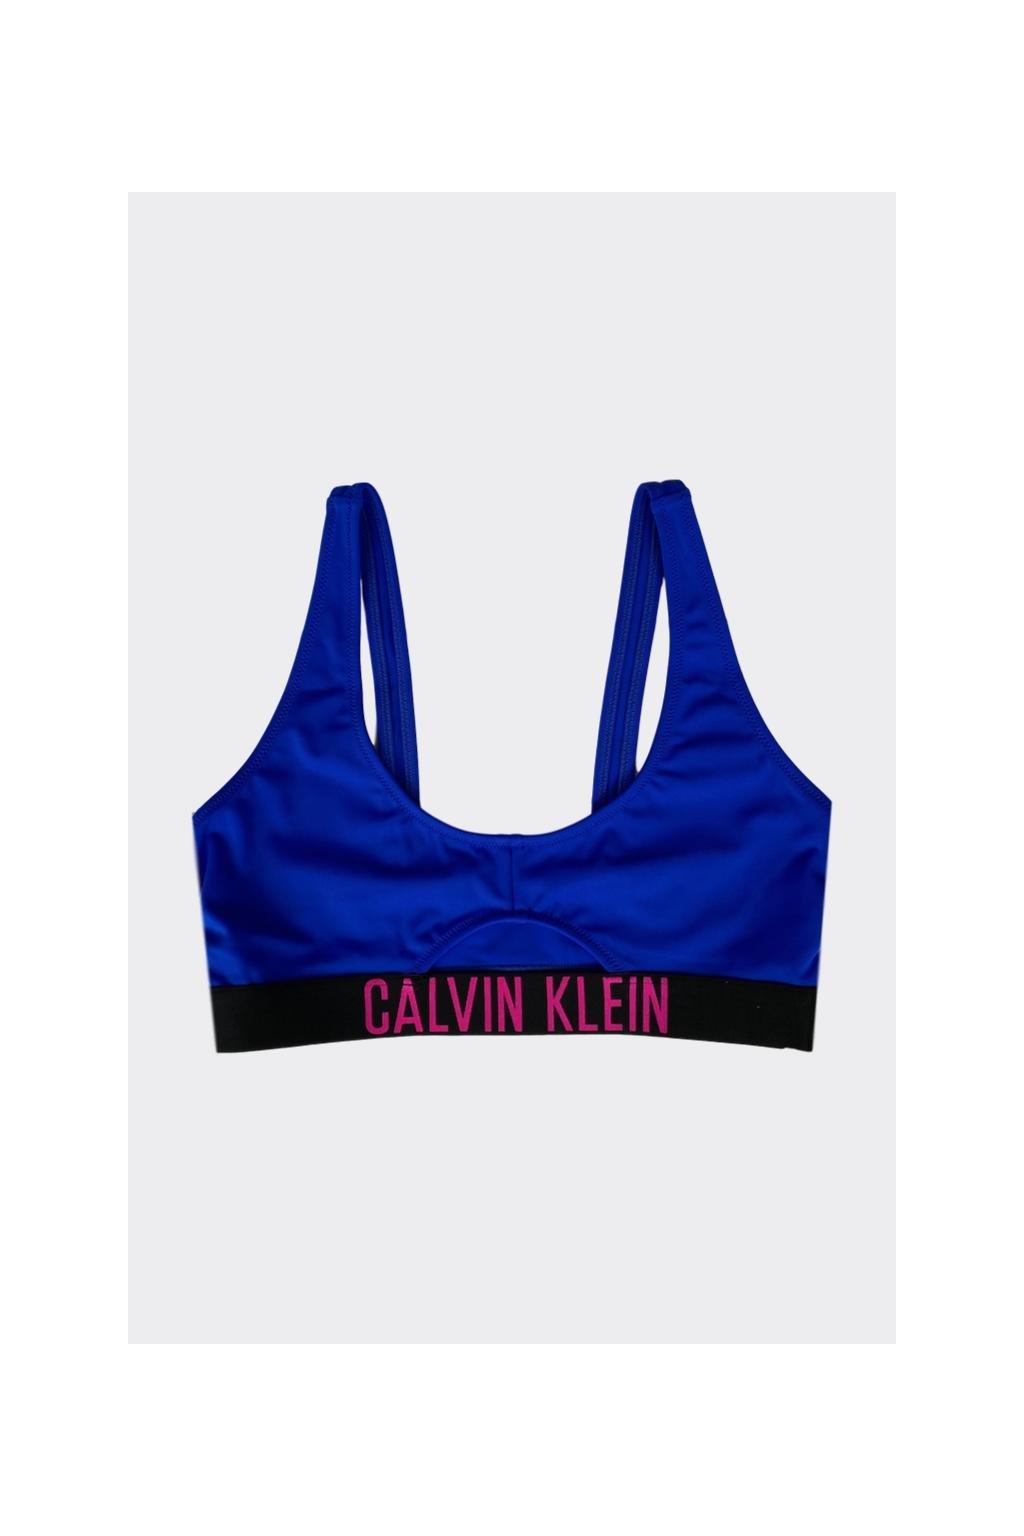 Calvin Klein Intense Power Cut out bralette vrchní díl plavek - modrá